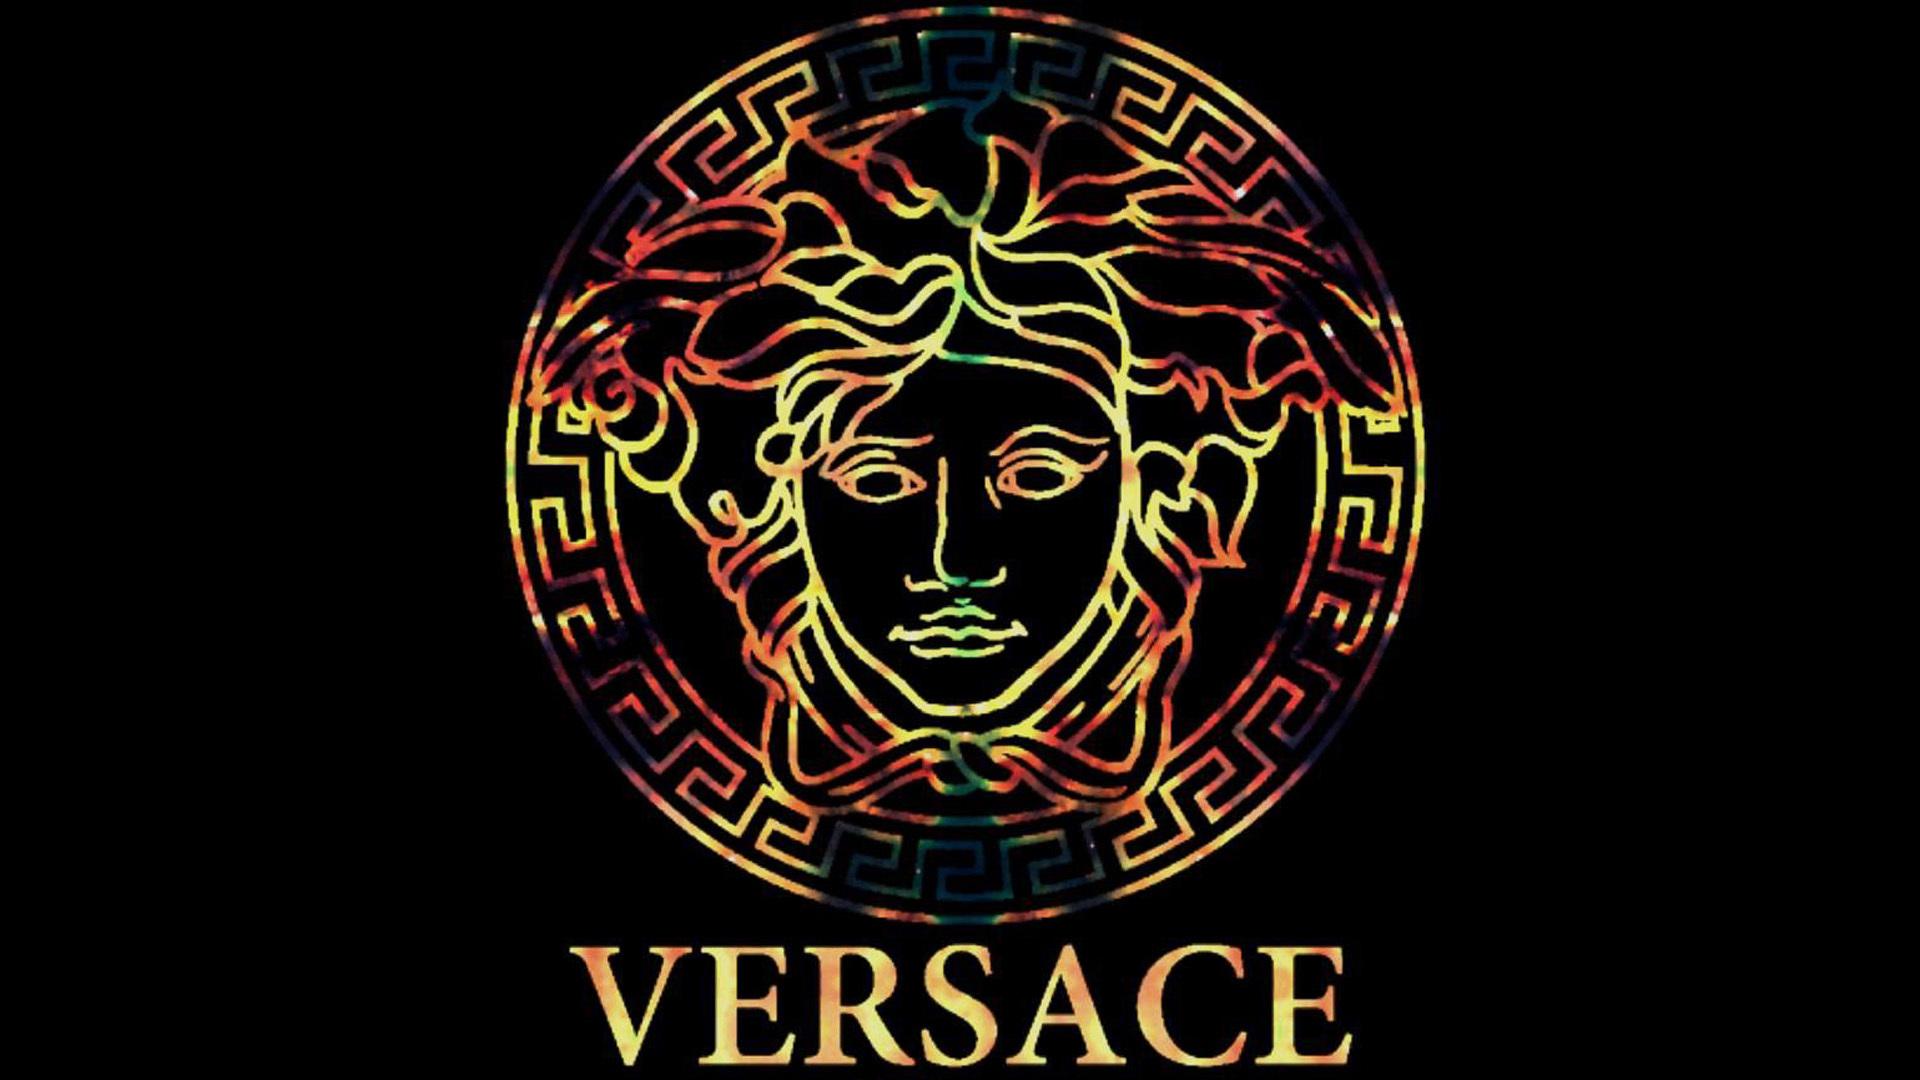 Versace Background Versace Wallpapers Ima...